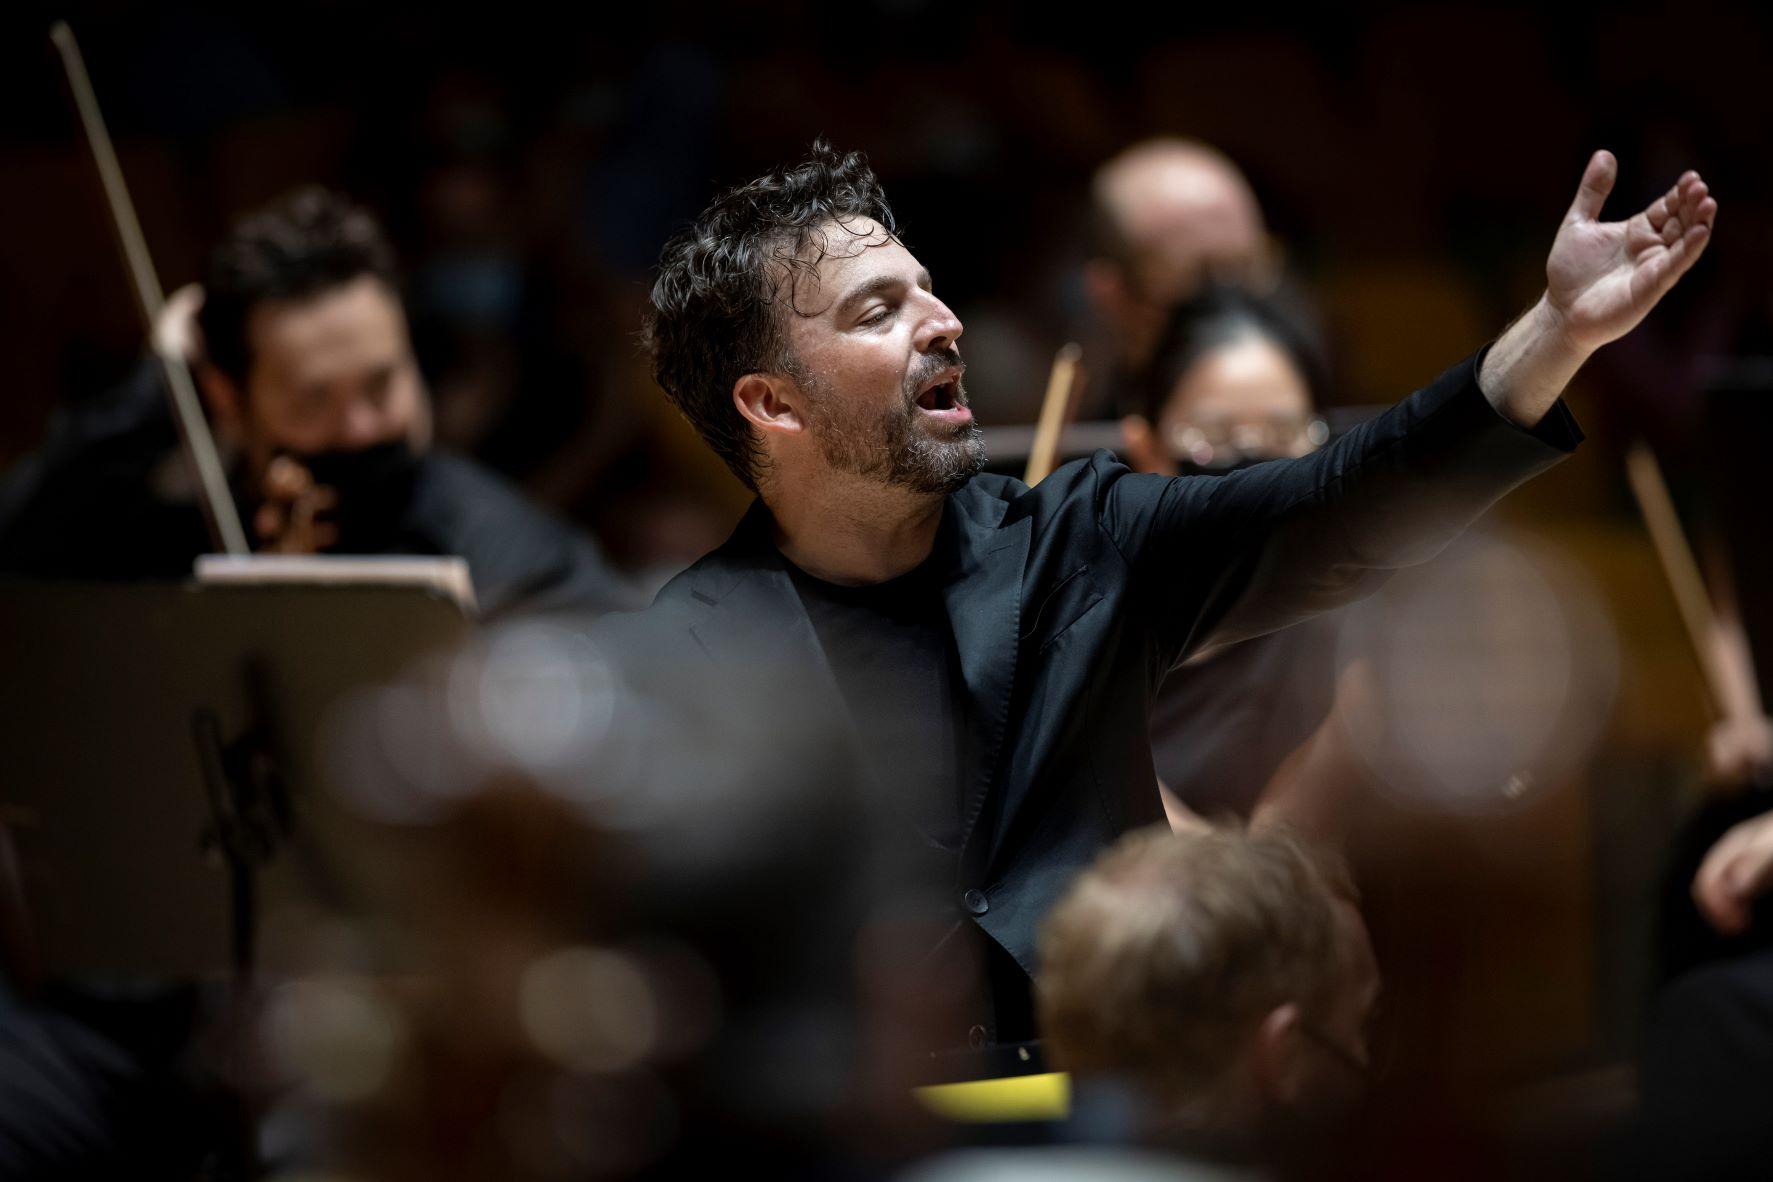 Crítica: Prometedor inicio de la Orquestra de la Comunitat Valenciana con James Gaffigan